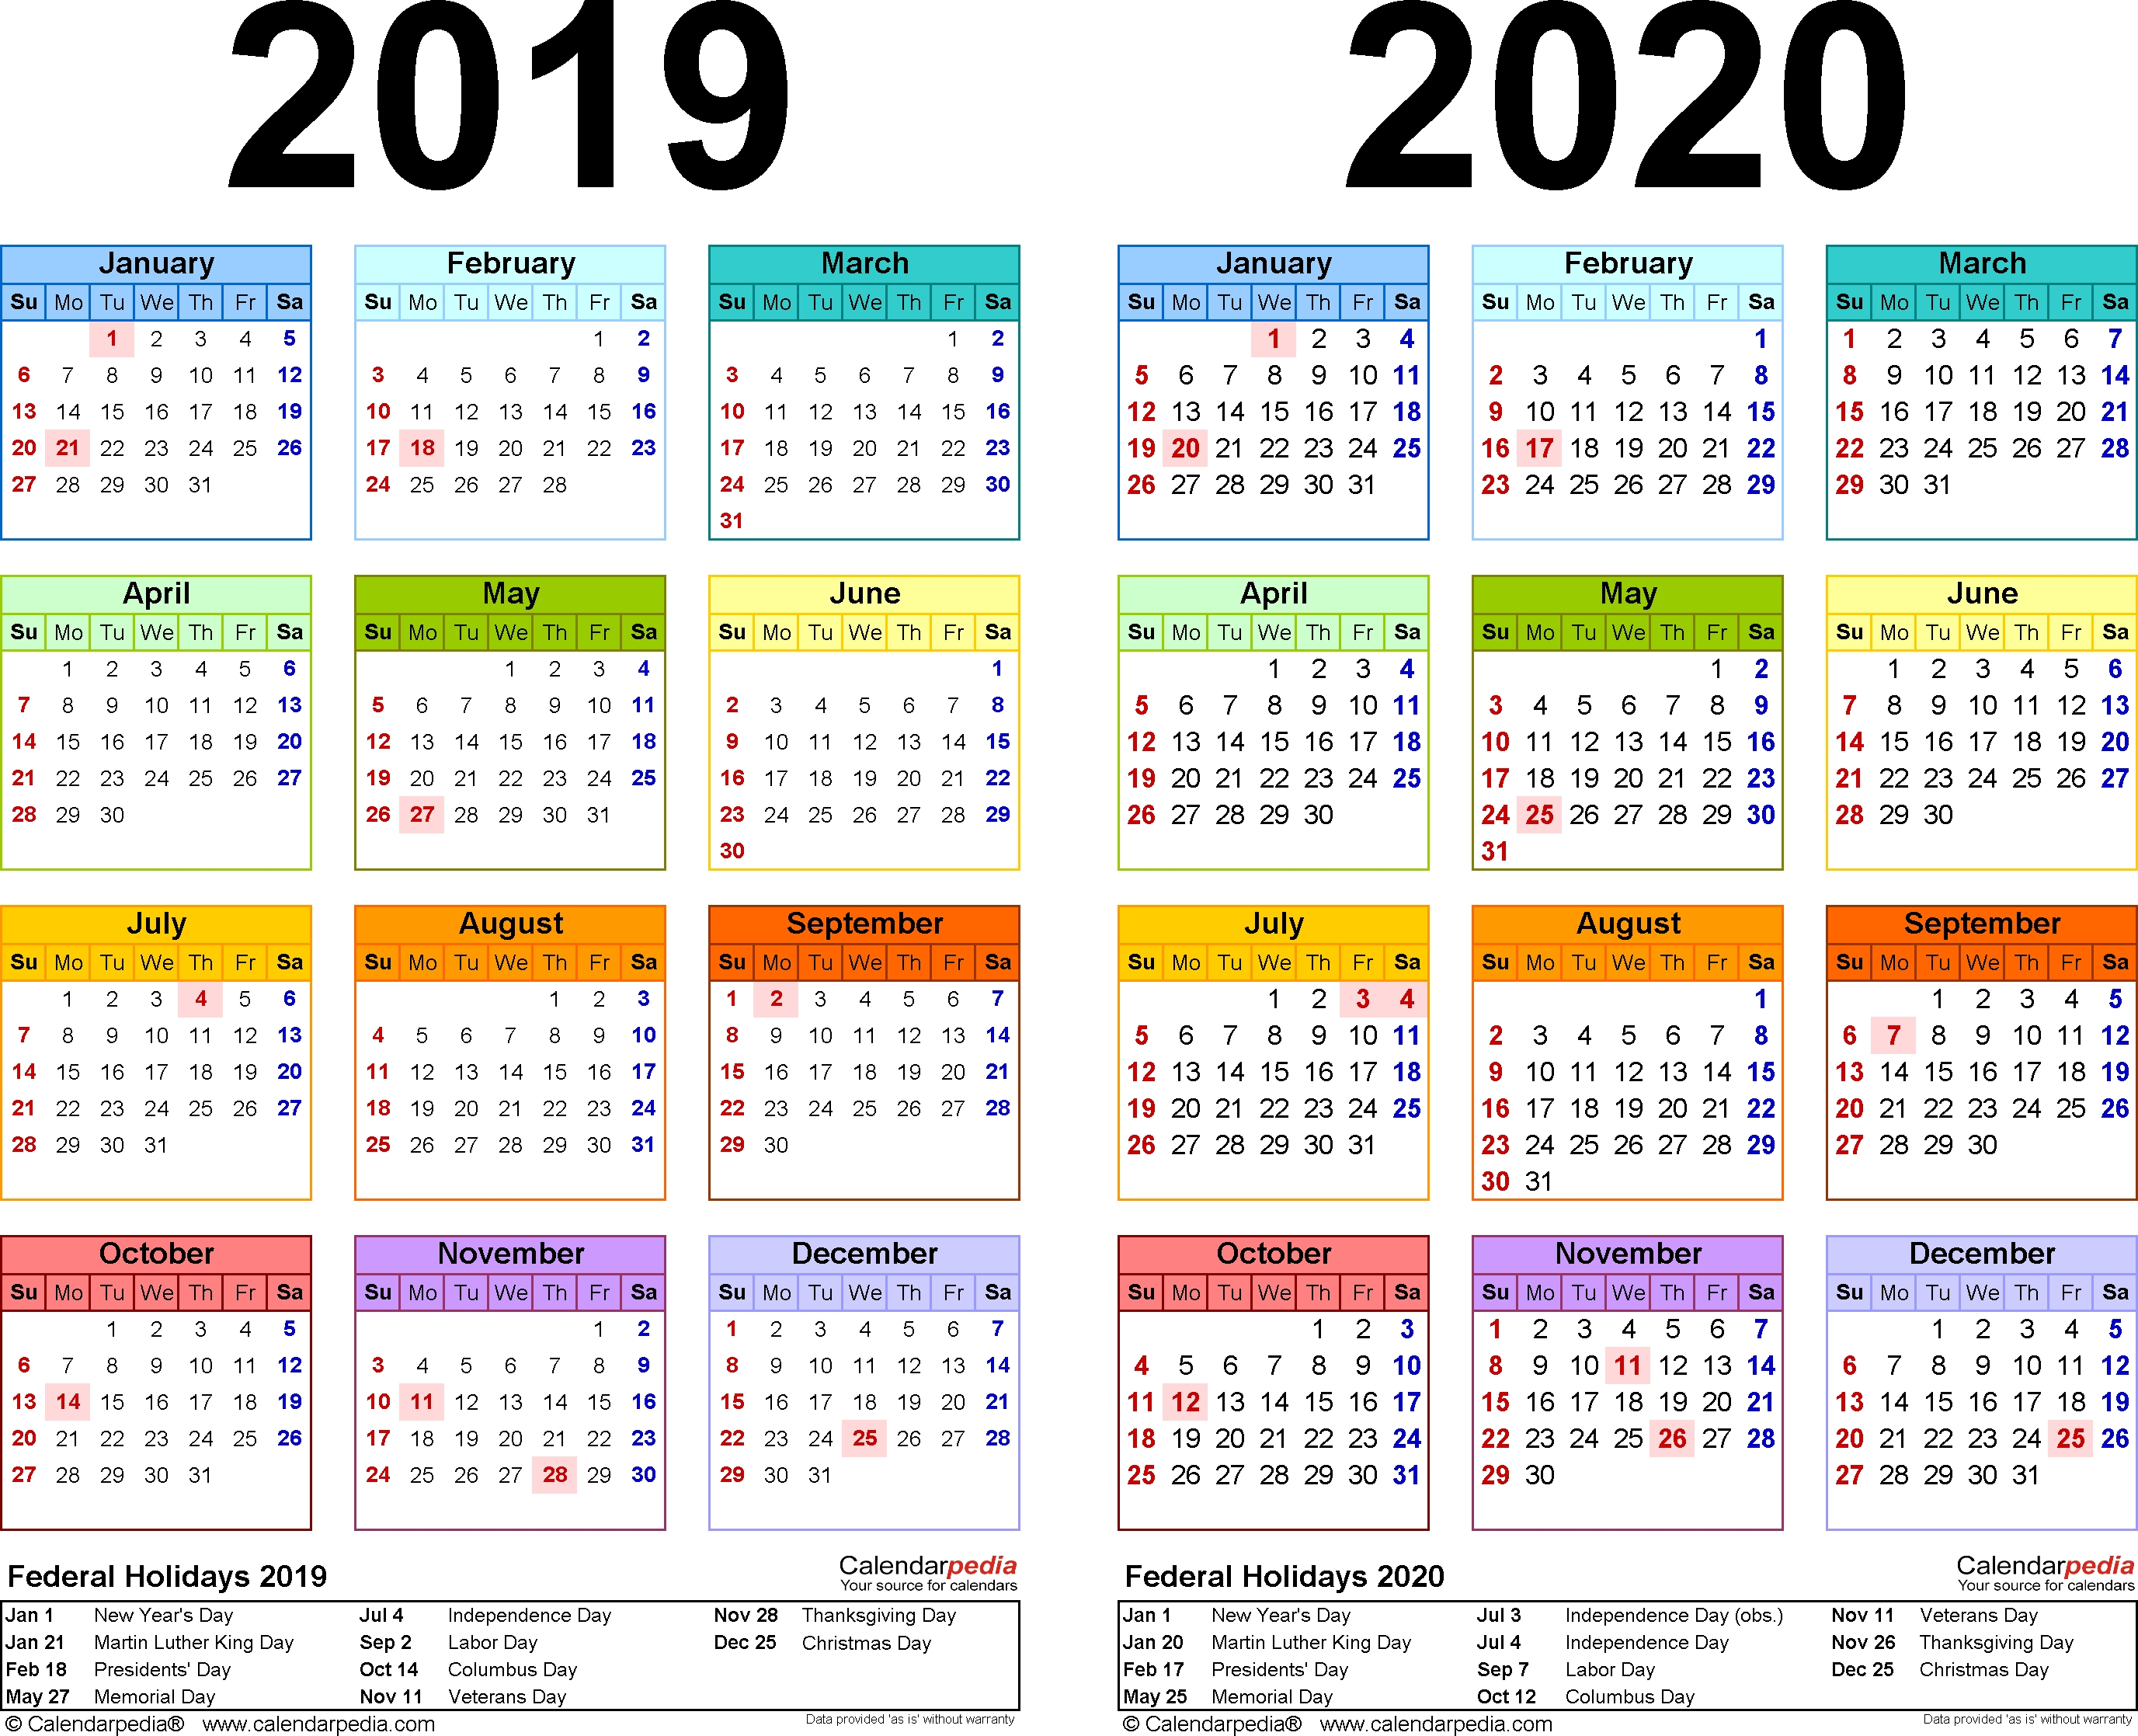 2019-2020 Two Year Calendar - Free Printable Microsoft Word throughout 2019 2020 Financial Year Calendar